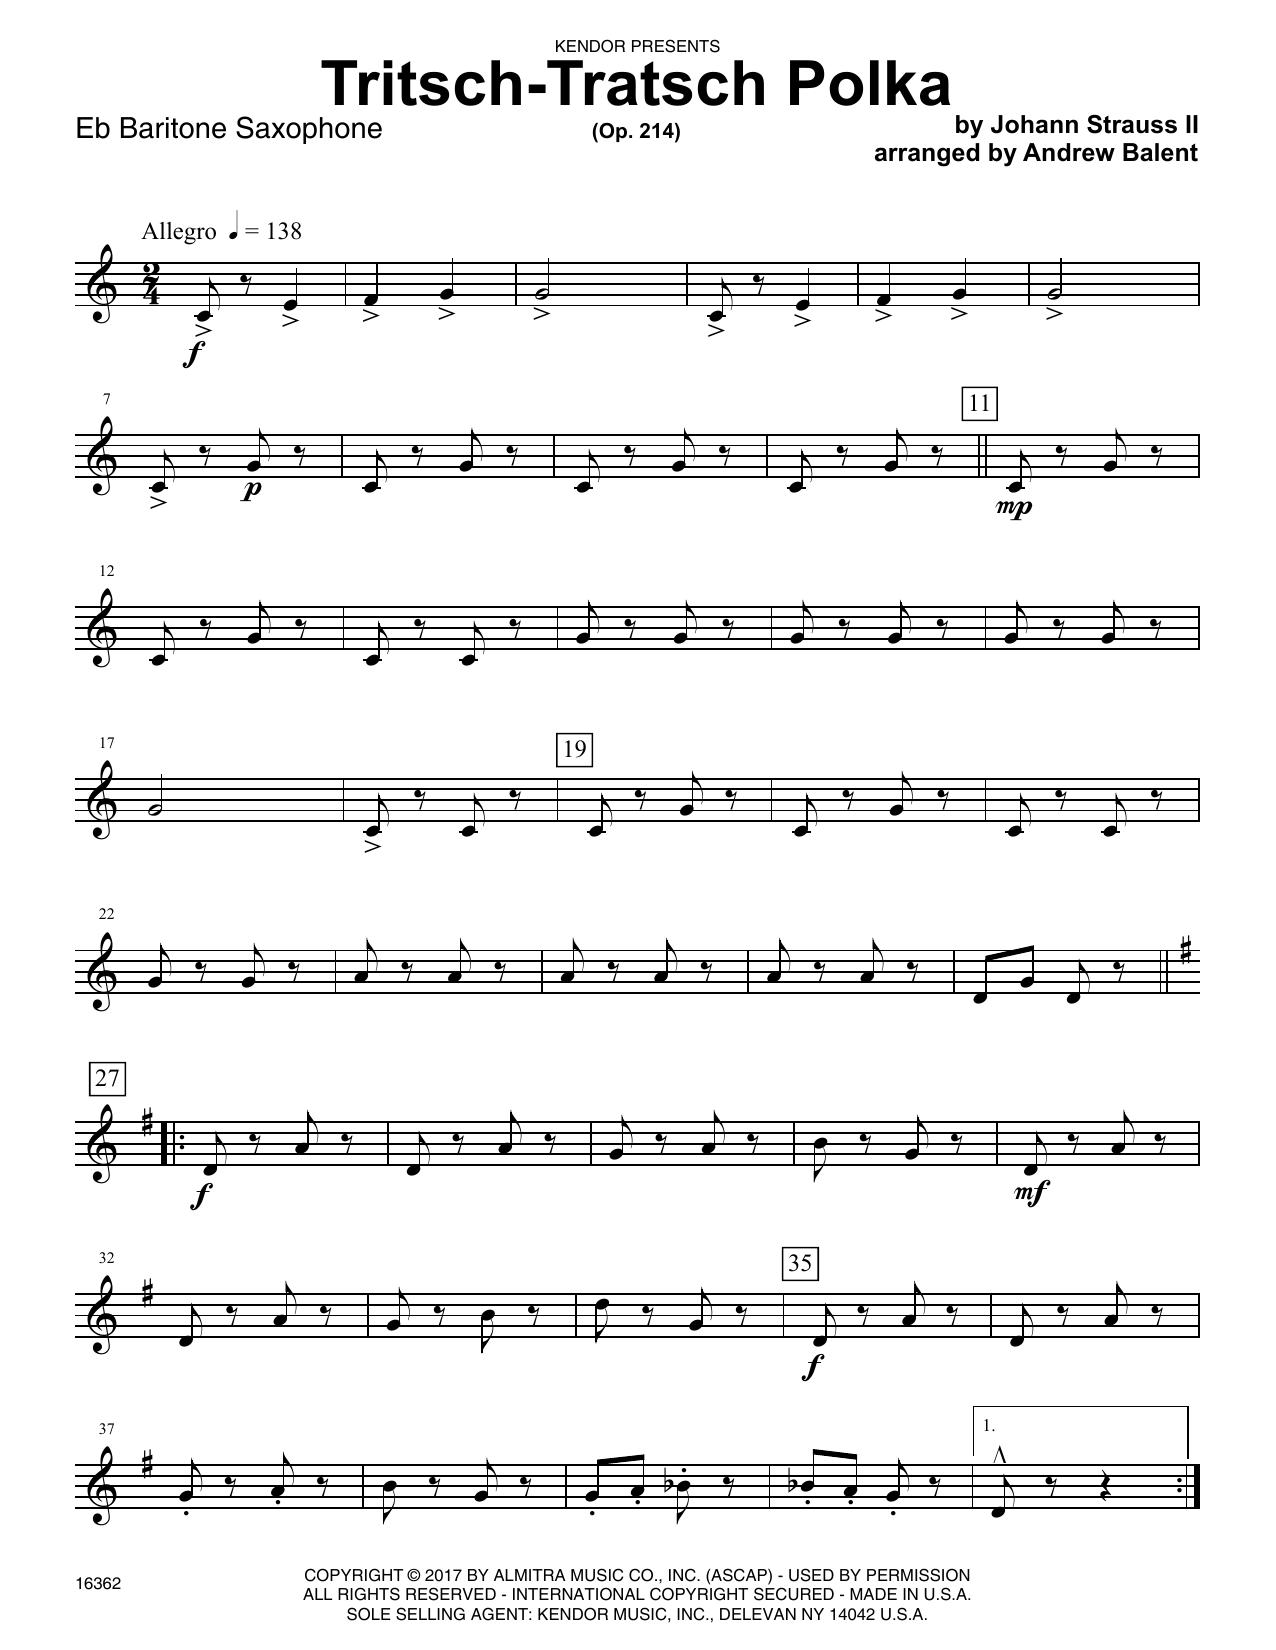 Andrew Balent Tritsch-Tratsch Polka (Op. 214) - Eb Baritone Saxophone sheet music notes printable PDF score